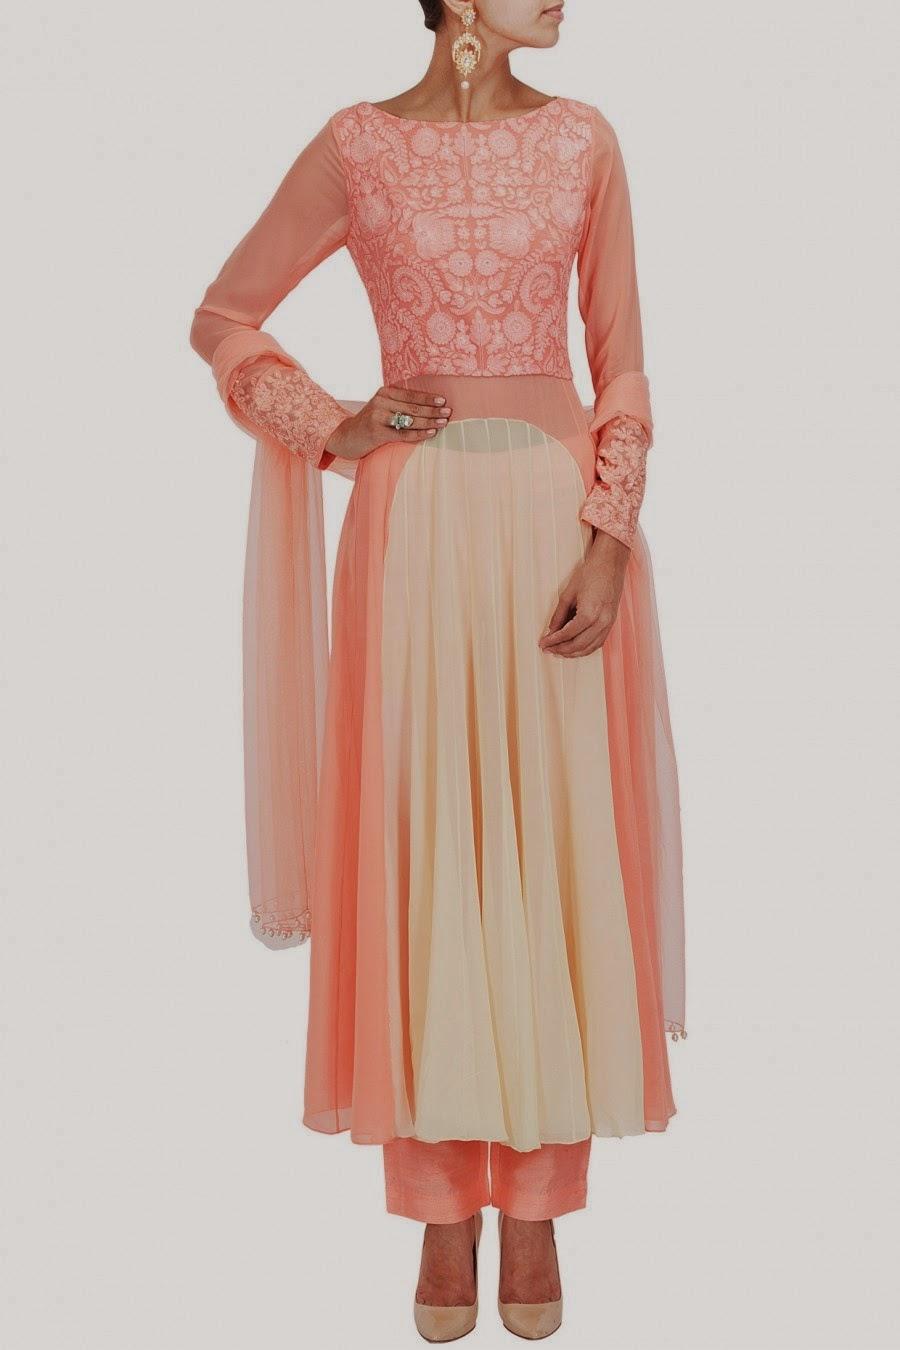 Manish Malhotra Designer Fancy Elegant Best Wedding Wear Dresses 2014 L Manish Malhotra Best